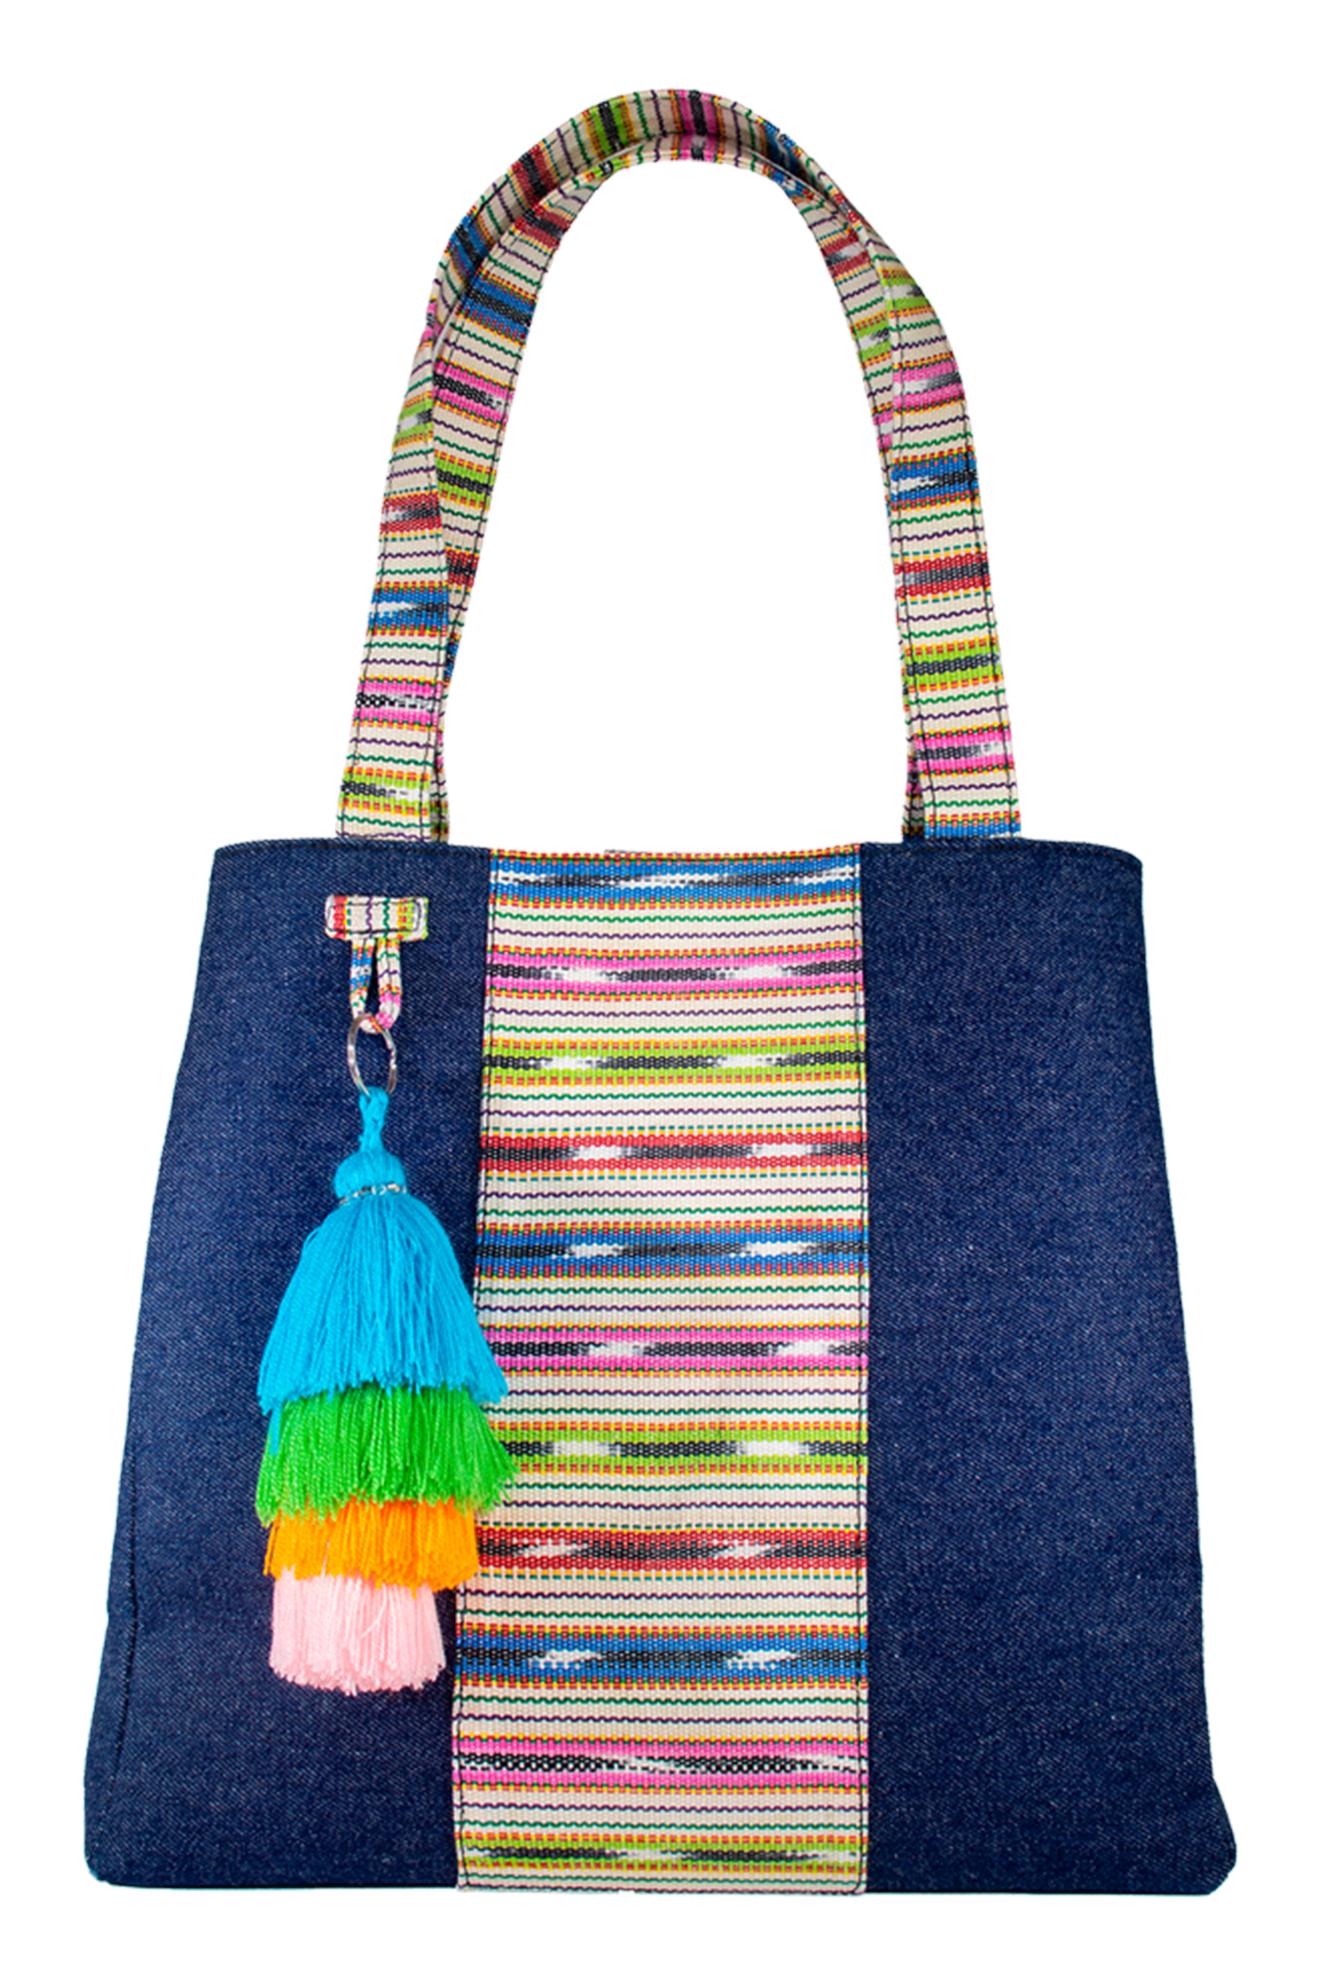 A beautiful denim and Guatemalan handwoven cotton textile shoulder bag